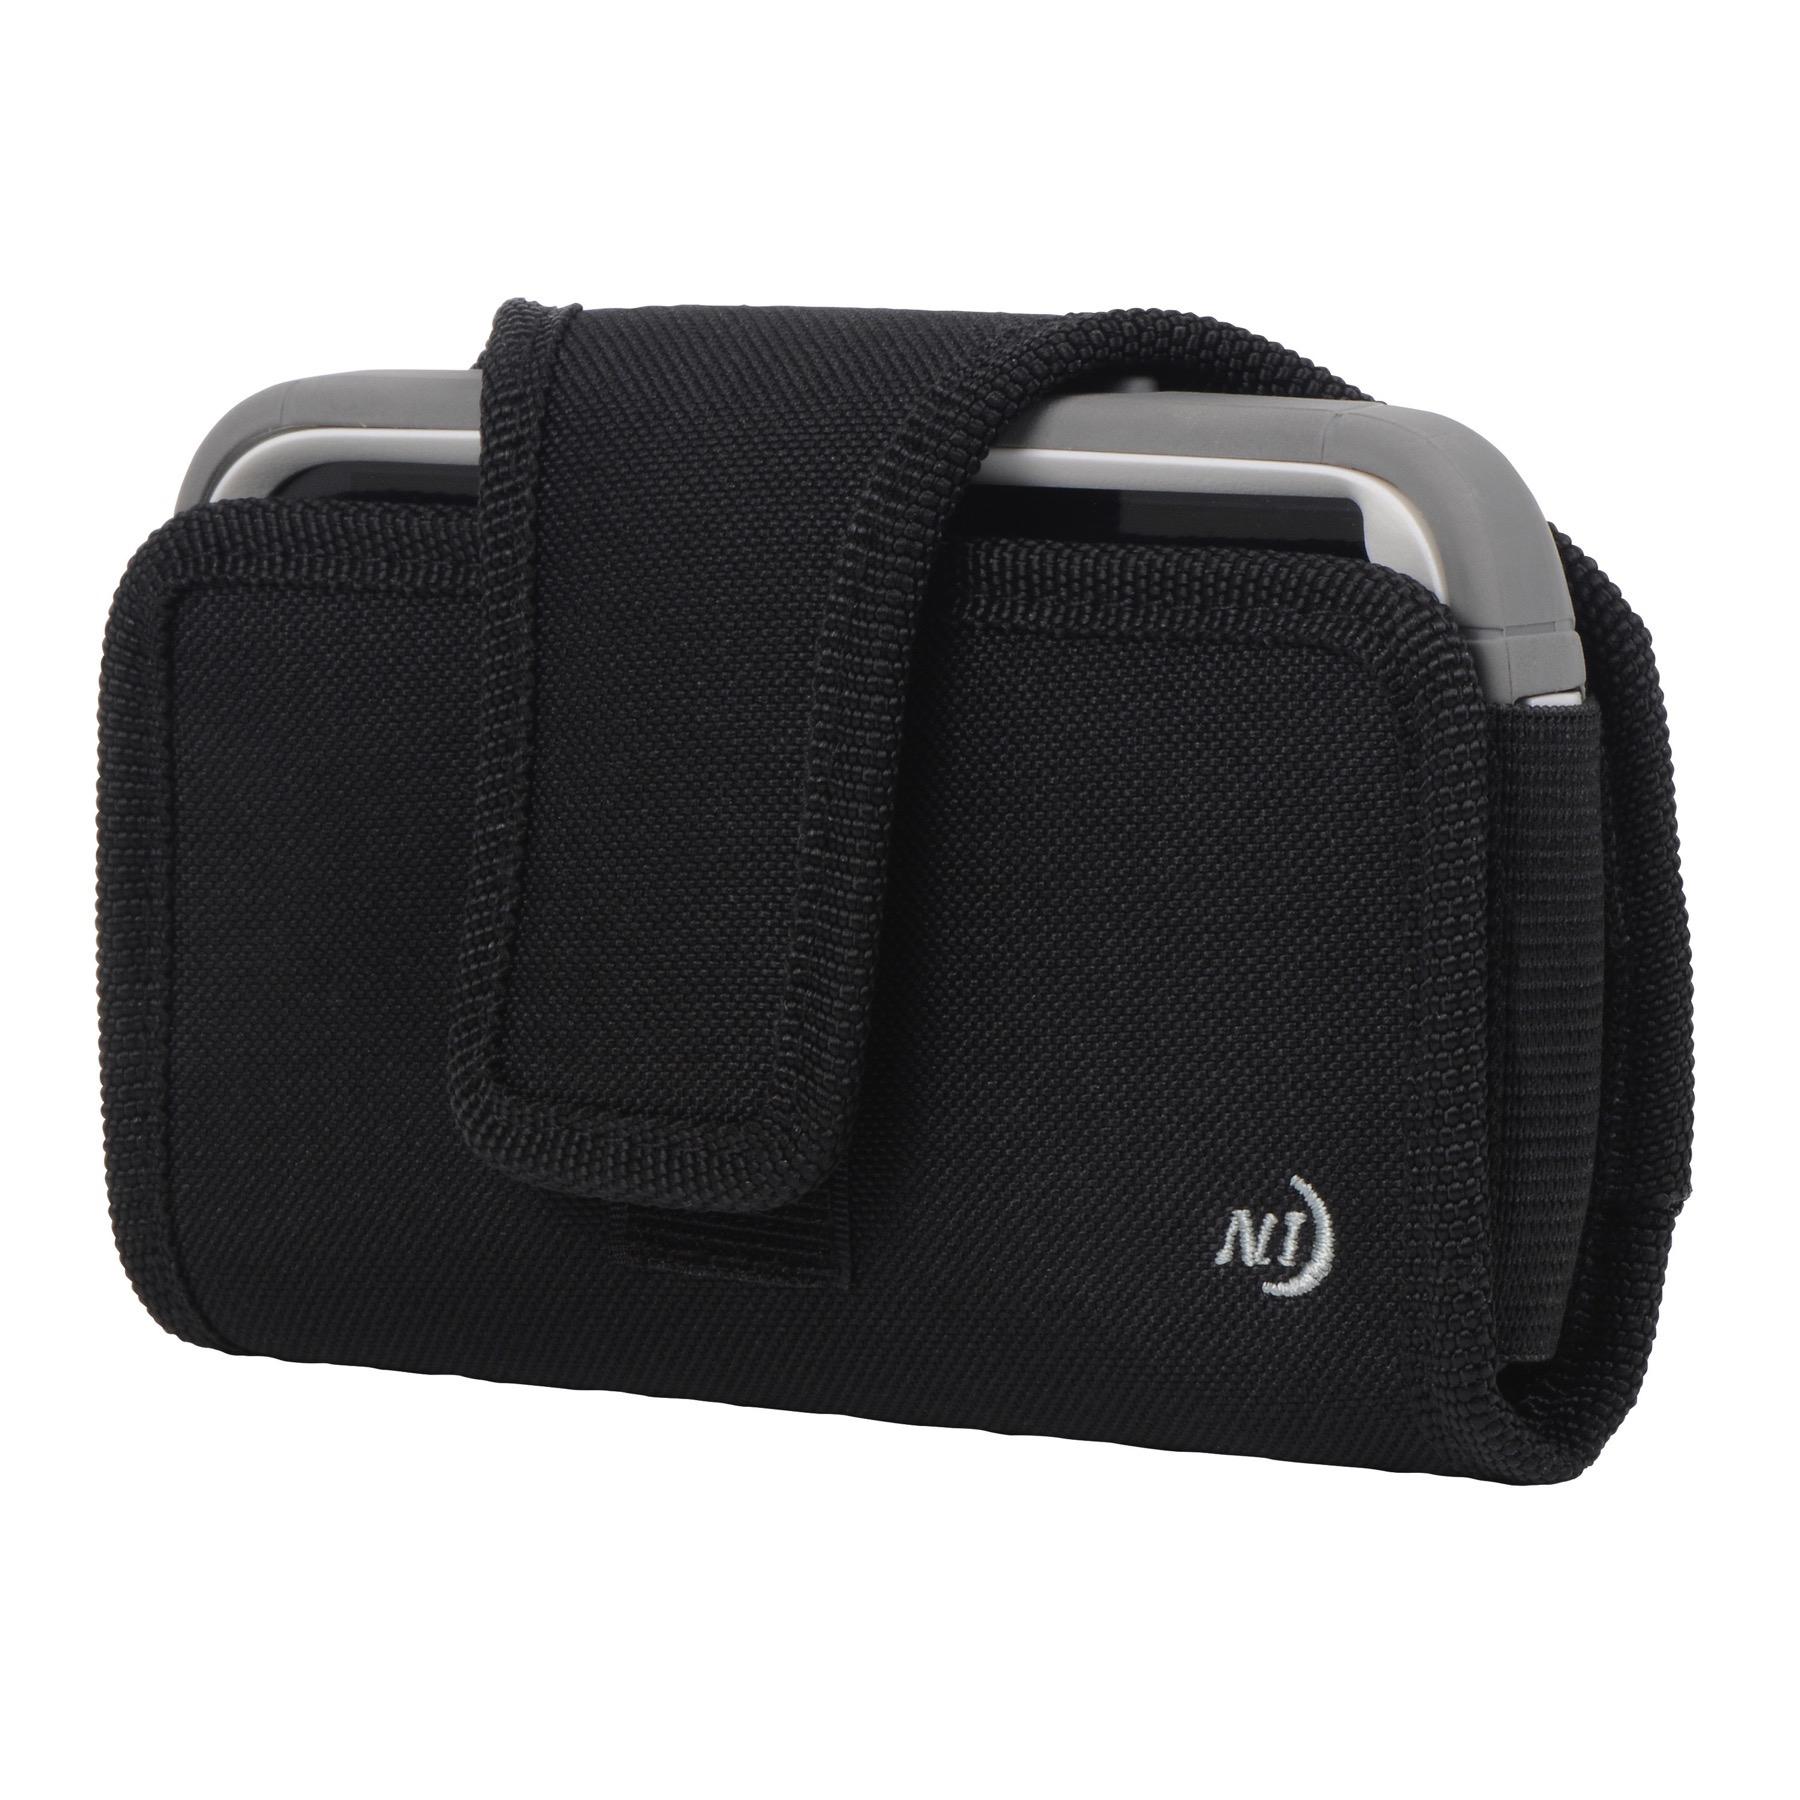 Nite Ize Fits All Phone Case Horizontal Black X-Large Rugged Holster Belt Clip